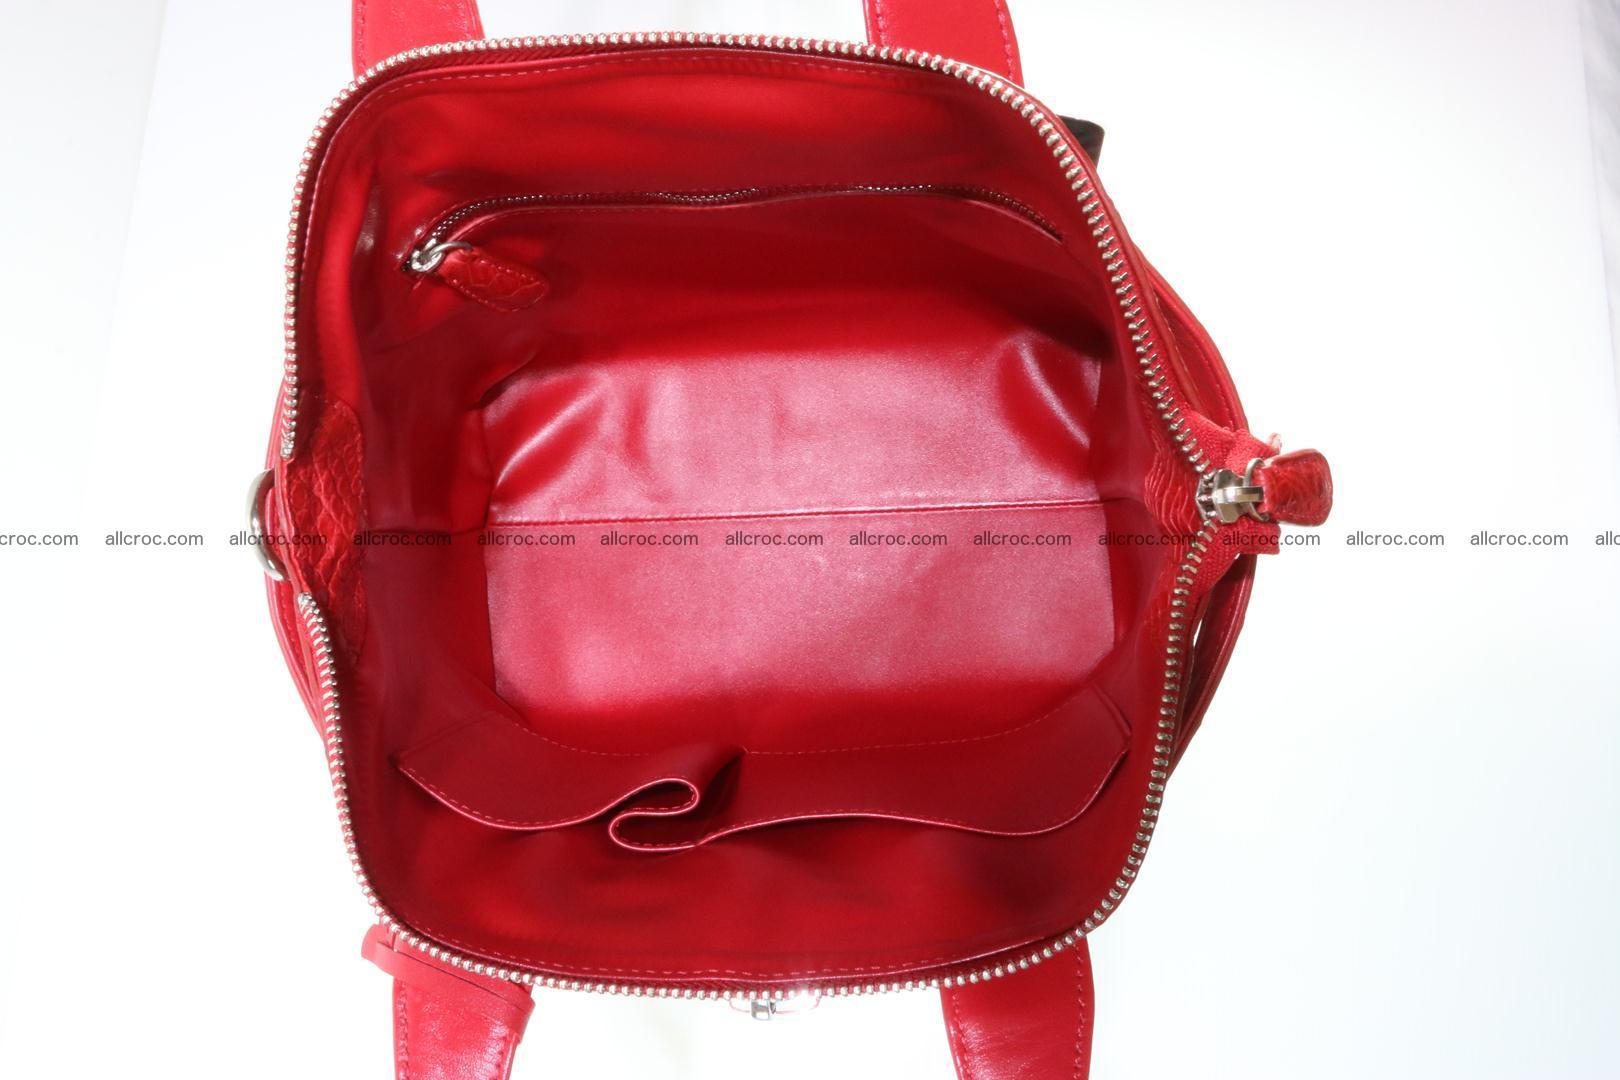 Genuine crocodile handbag for ladies 044 Foto 13